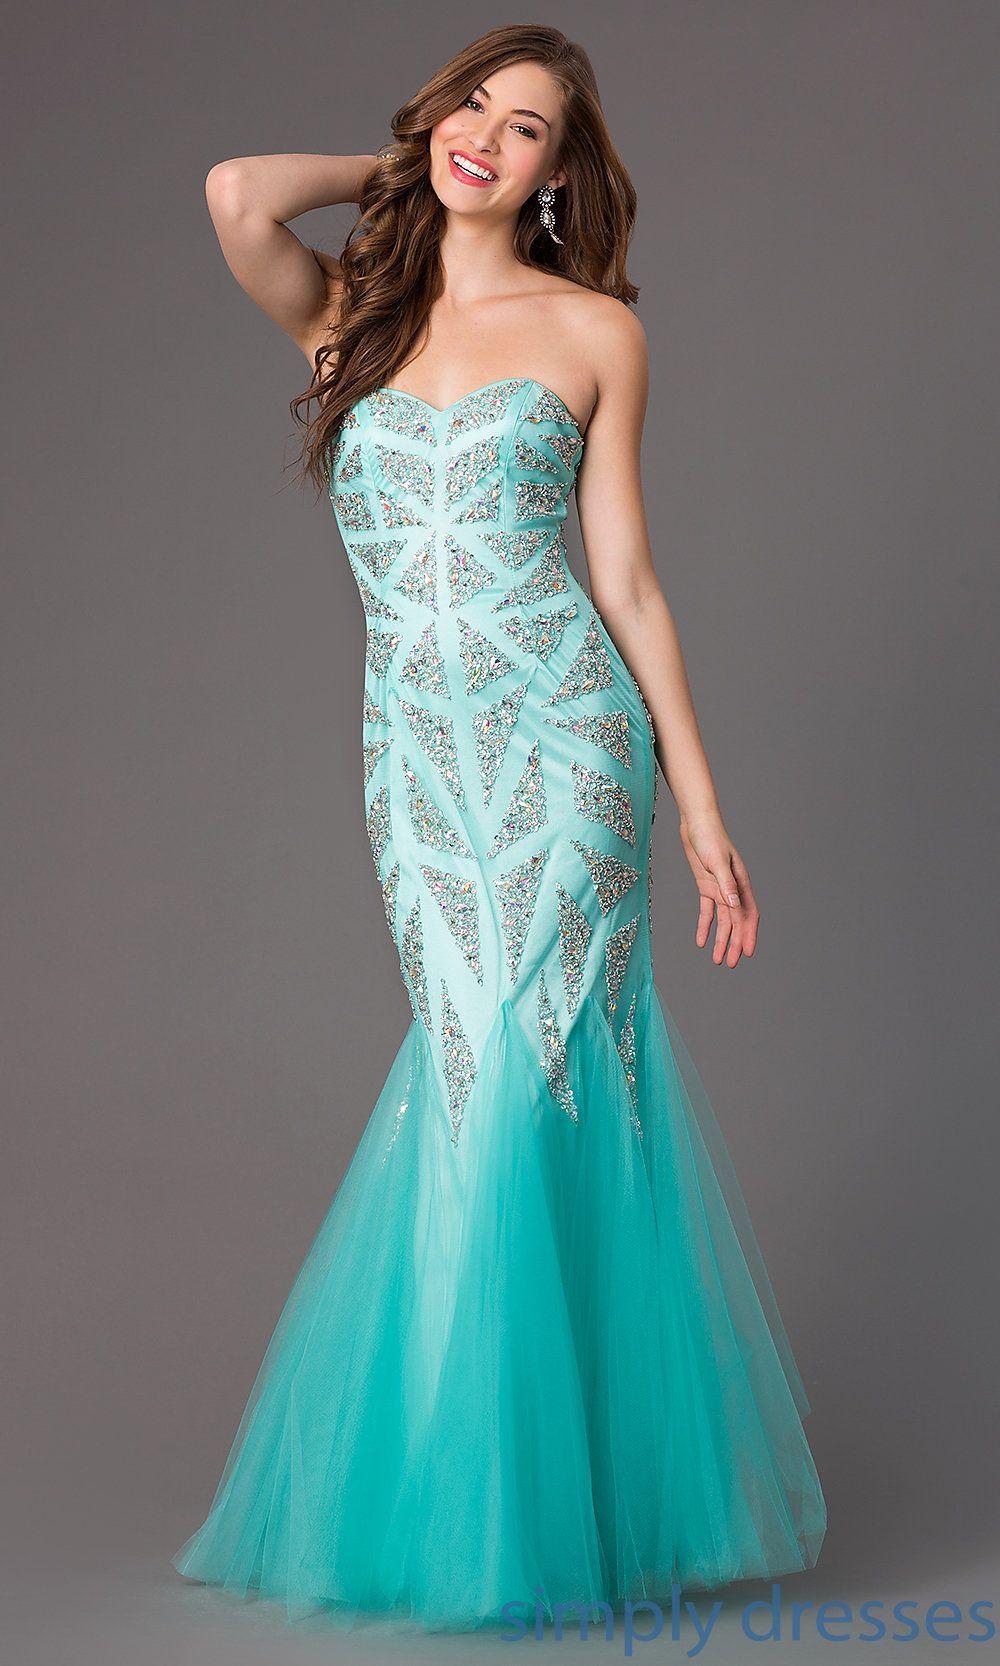 Dresses, Formal, Prom Dresses, Evening Wear: Strapless Sweetheart ...